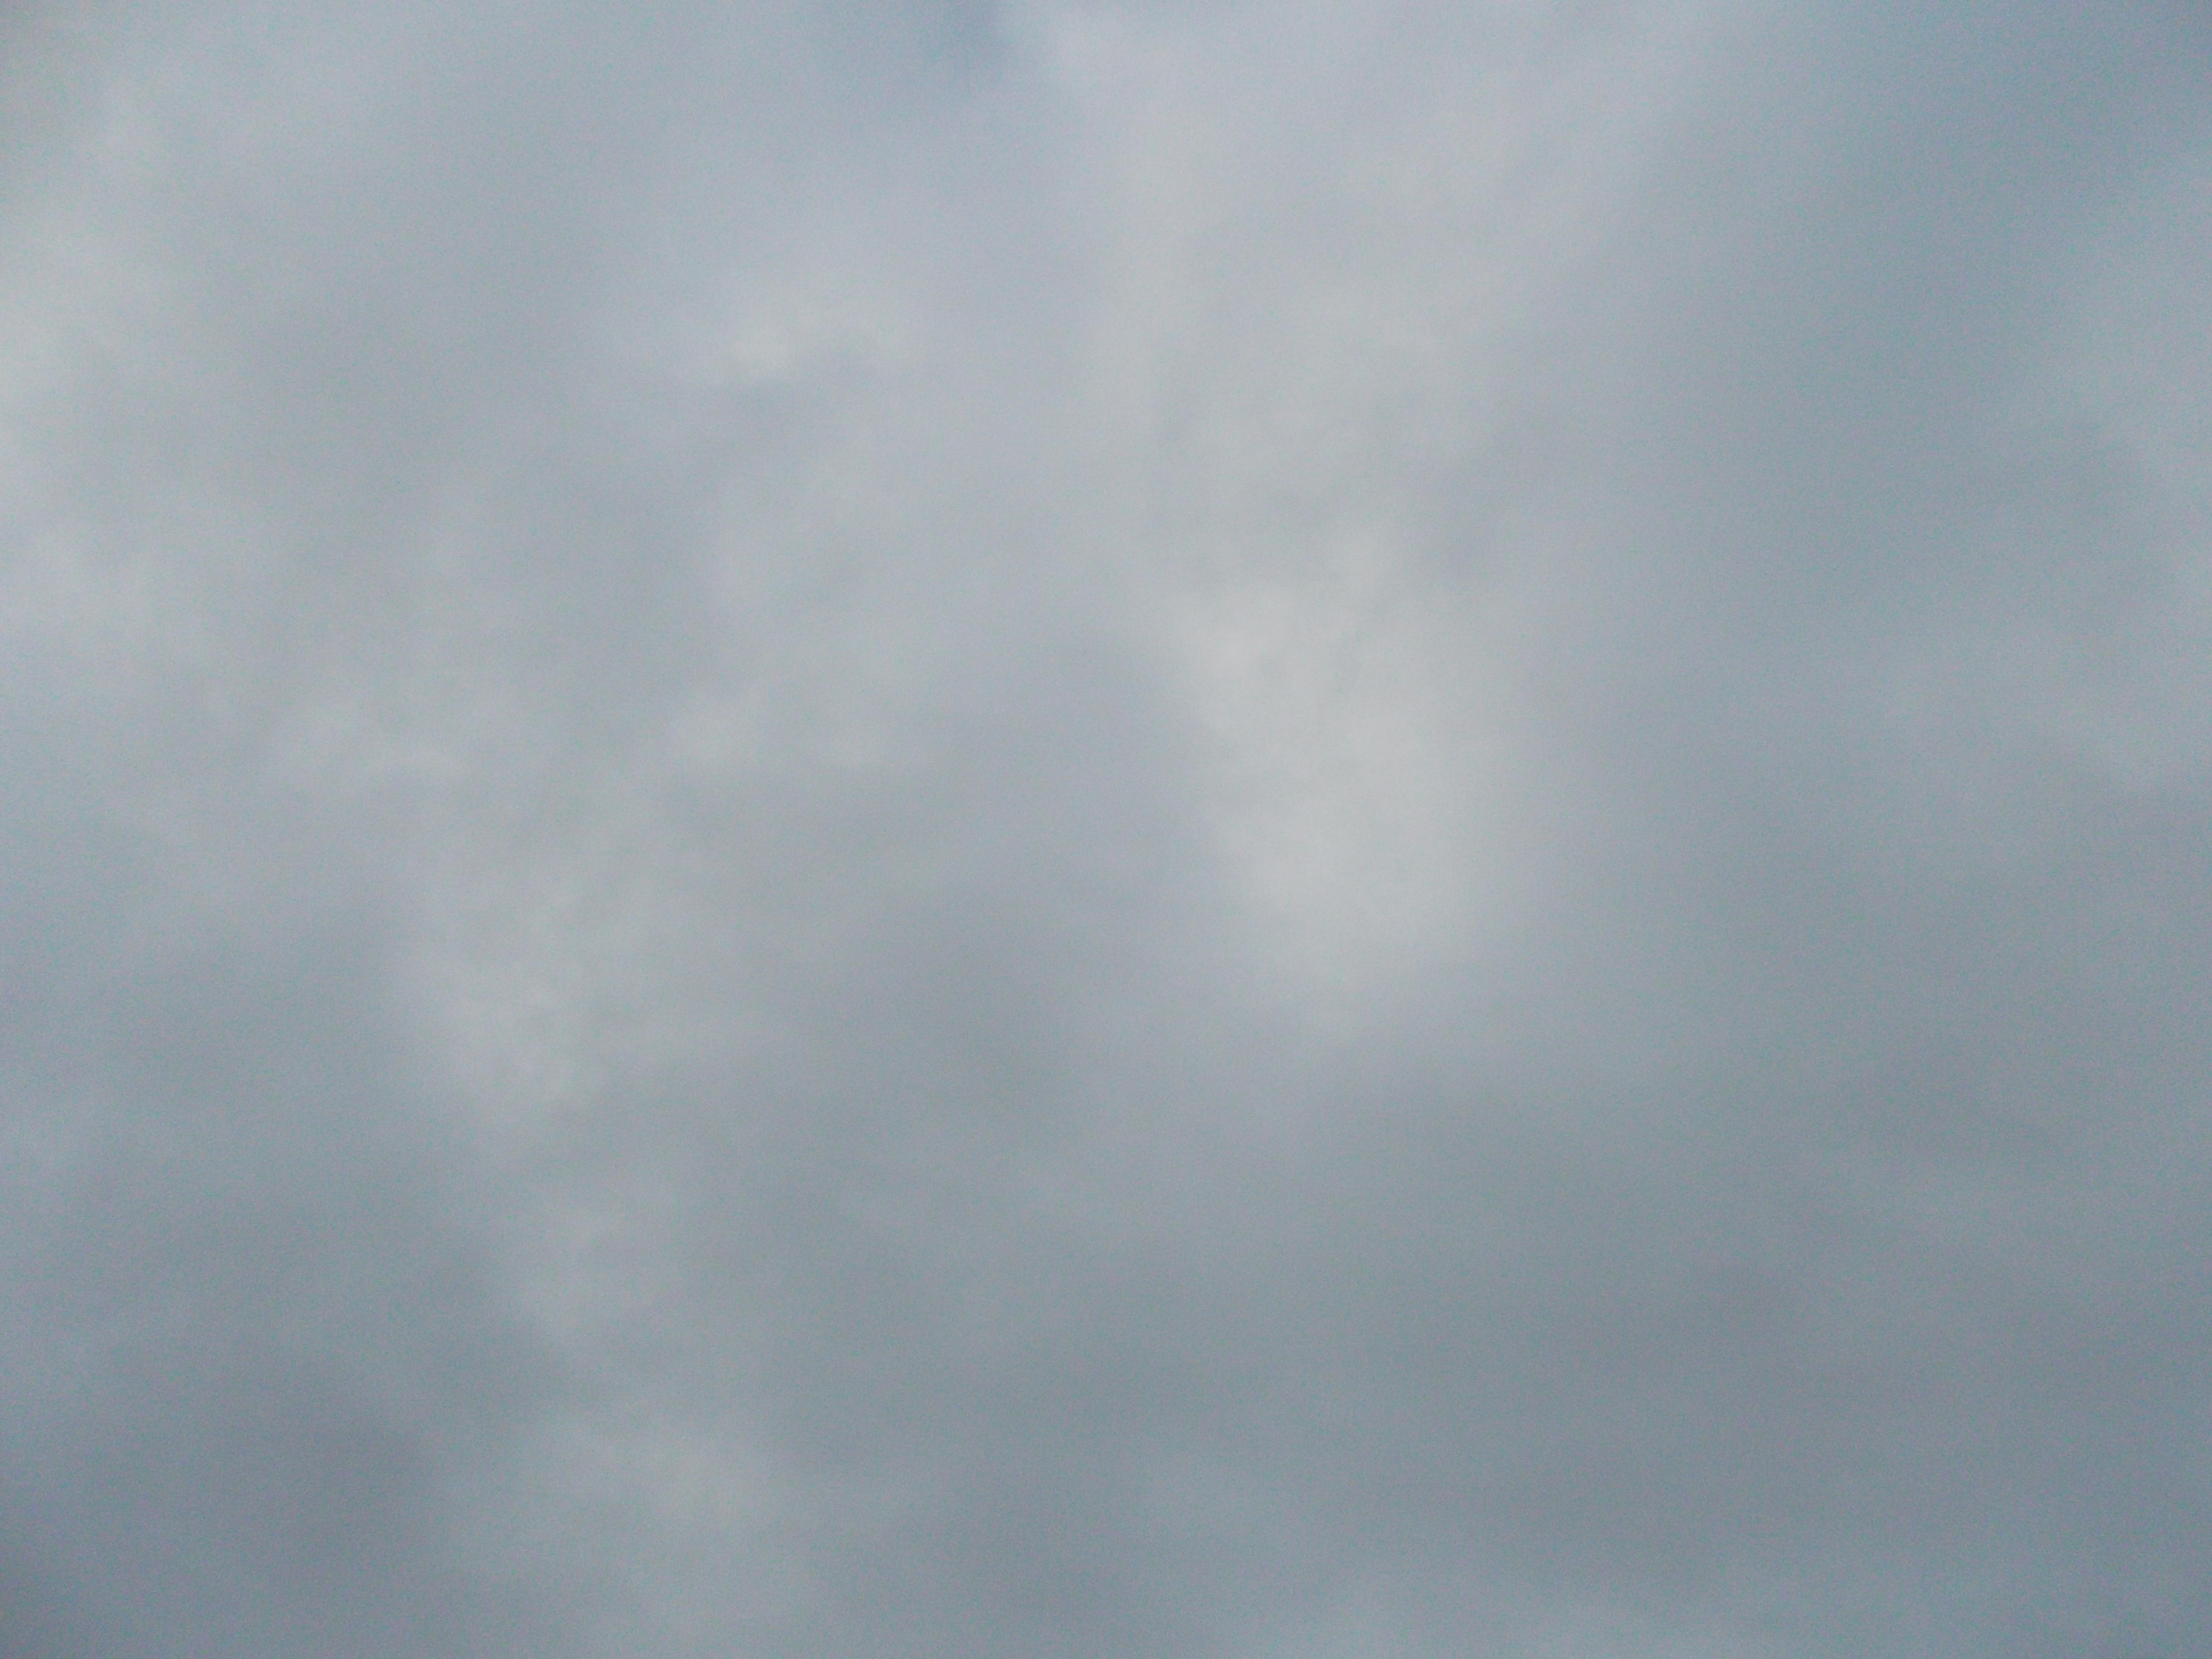 2013-01-14 Longitude -0.371 Latitude 49.182 Altitude 13 Heure 13h31